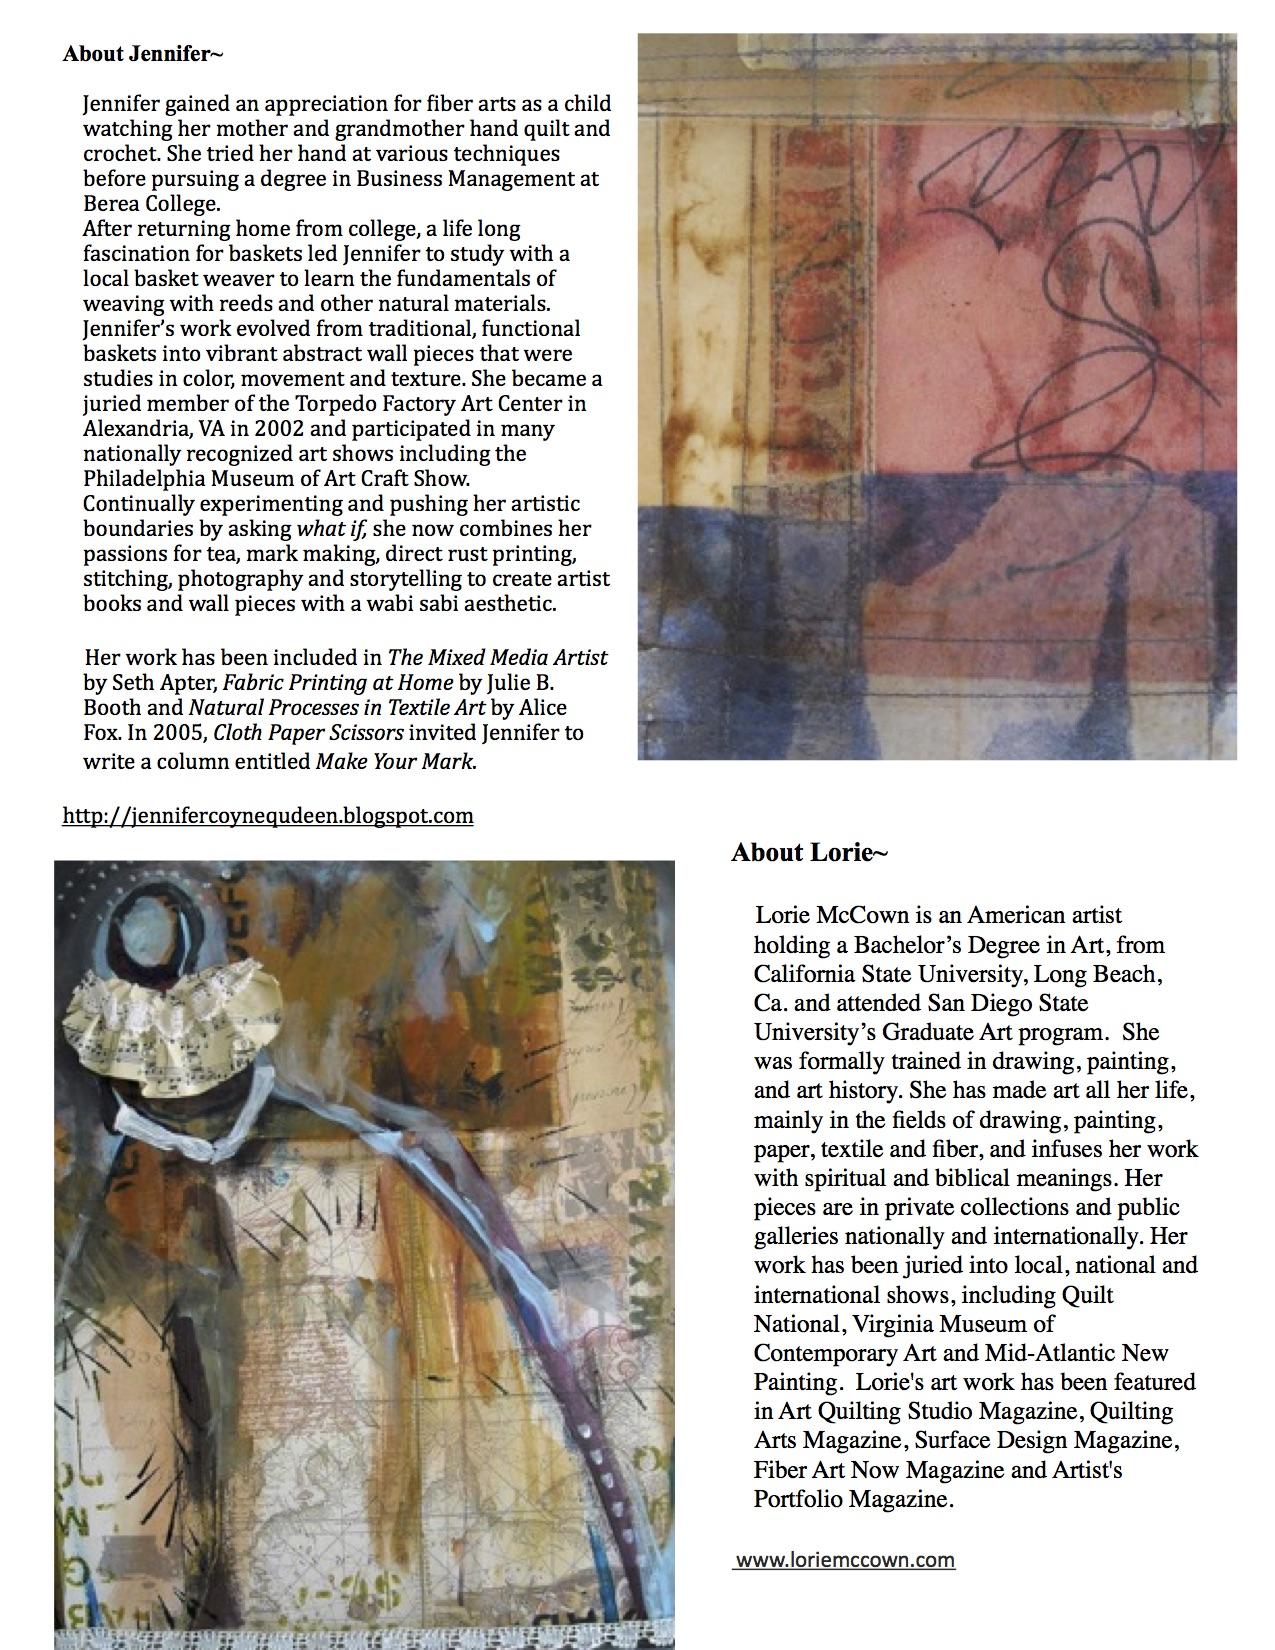 jenqud-and-lorie-mcc-workshop-flyer3